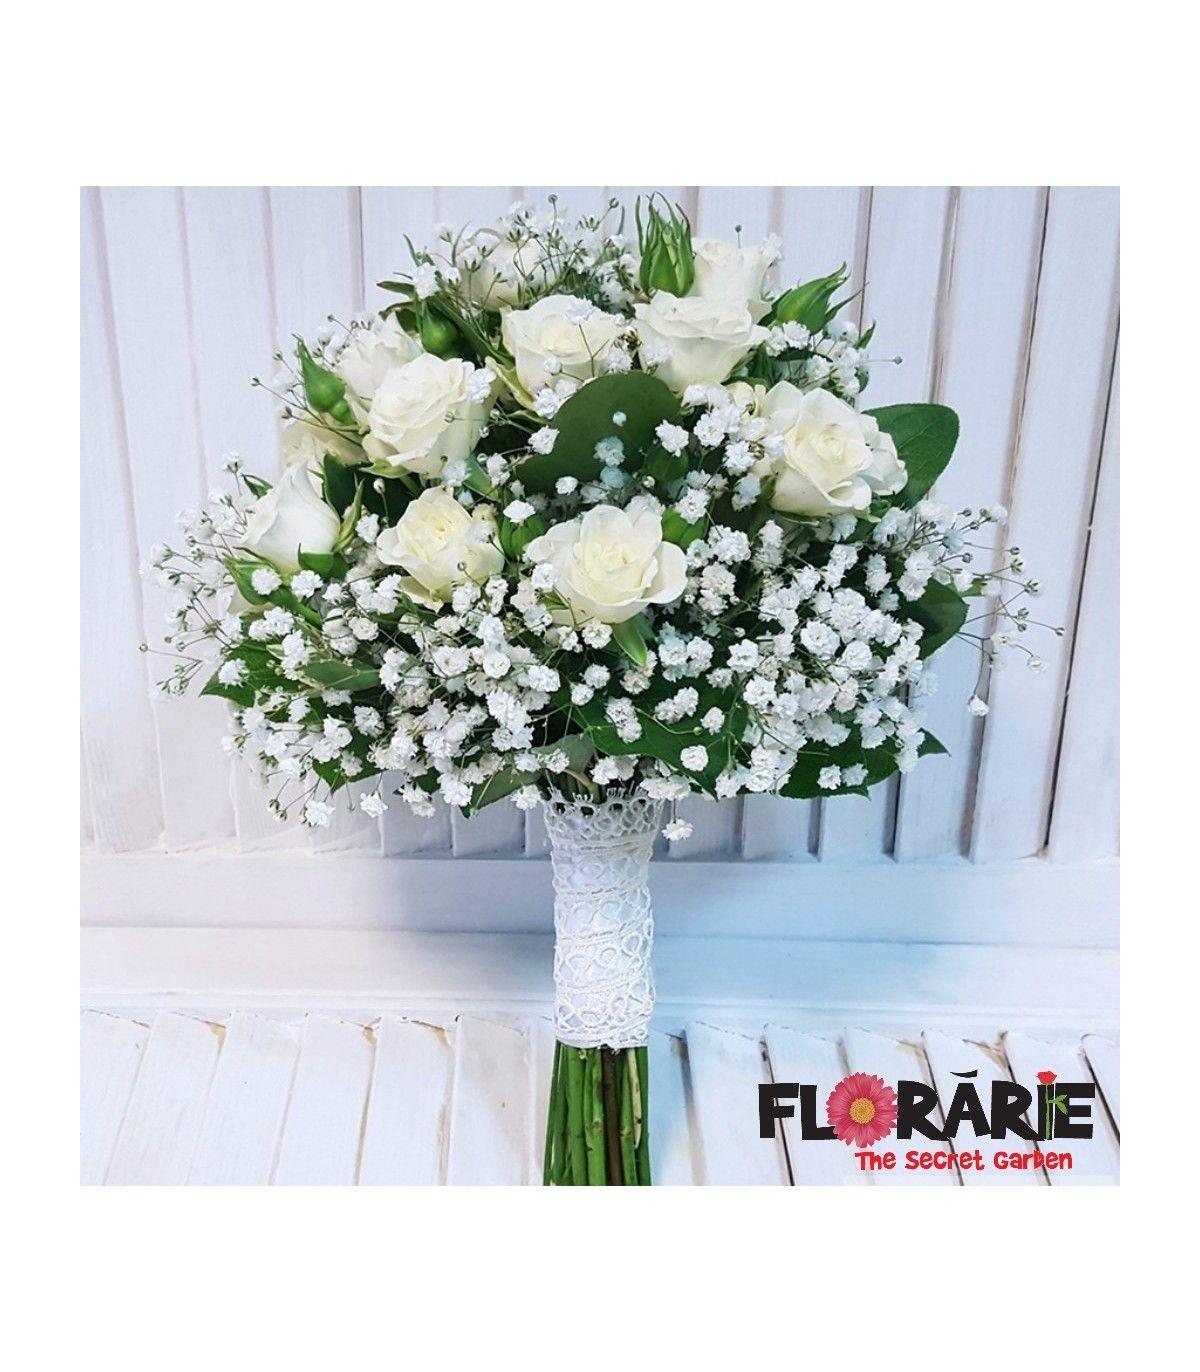 Buchet de mireasa realizat din minirose albe si floarea miresei, finisat cu ruscus. Buchetul de mireasa este accesorizat cu dantela si perlute asortate.